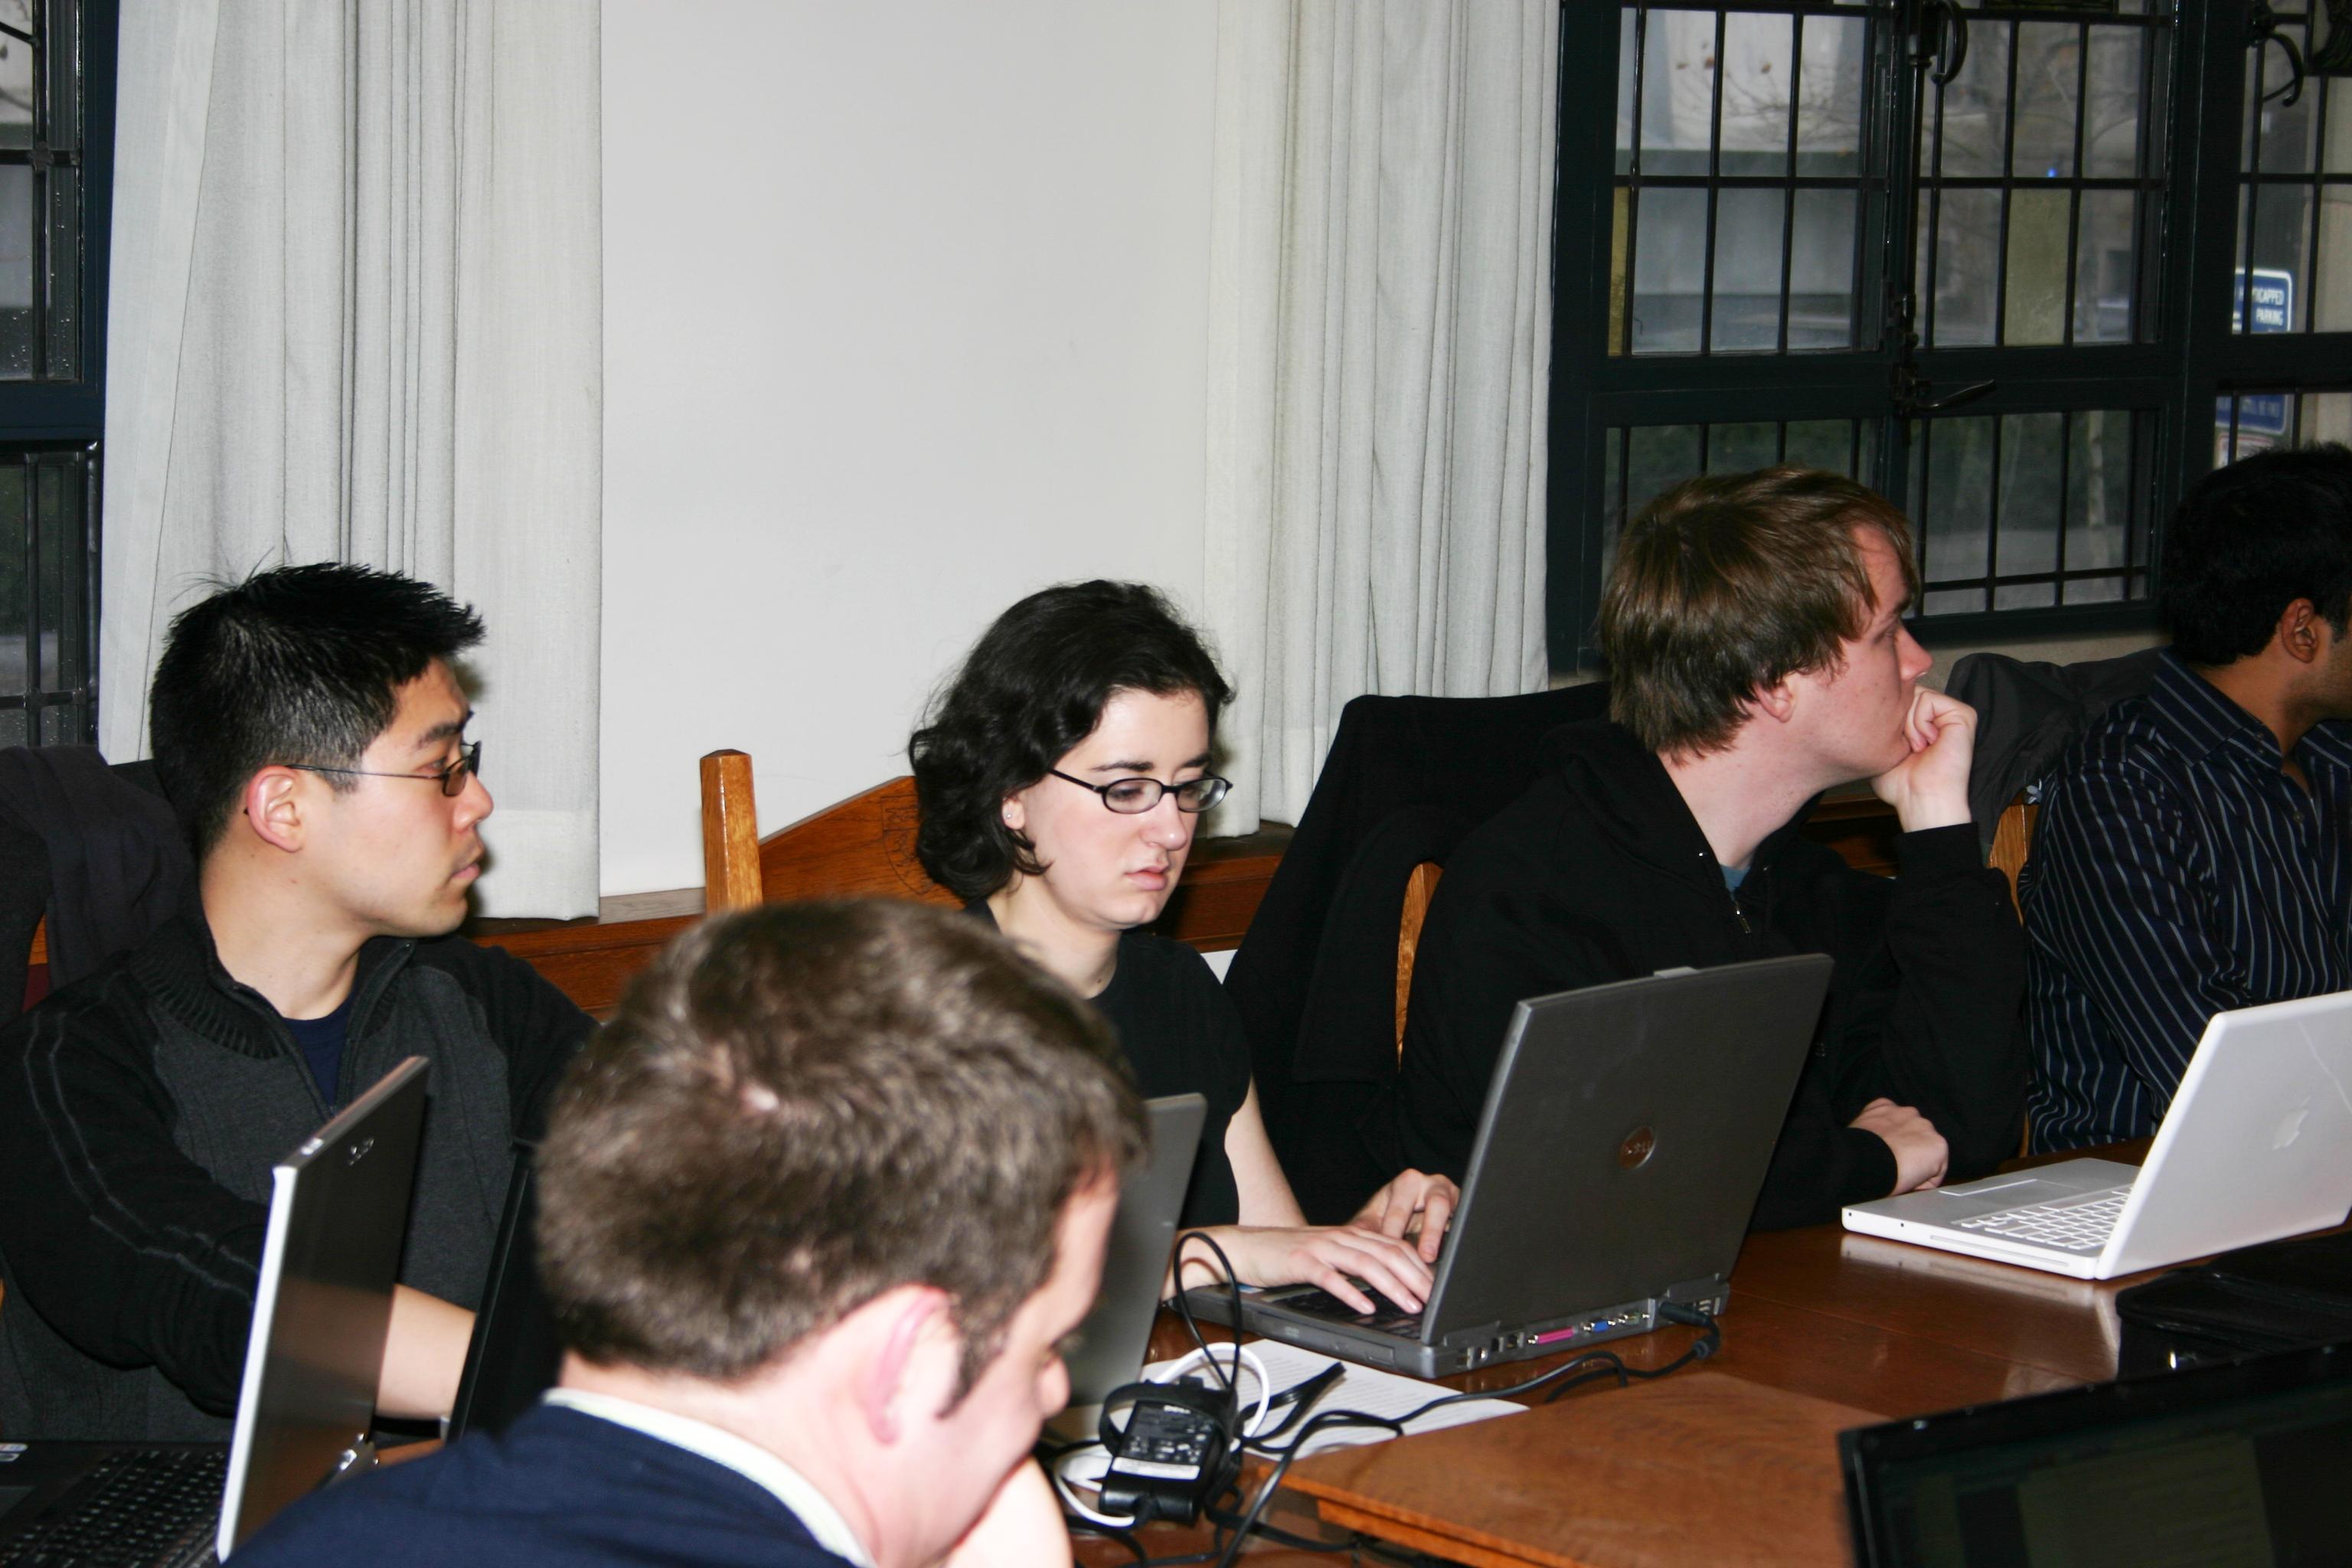 Andrew Park '08, Sara Jeruss '08, and Sander Daniels '09